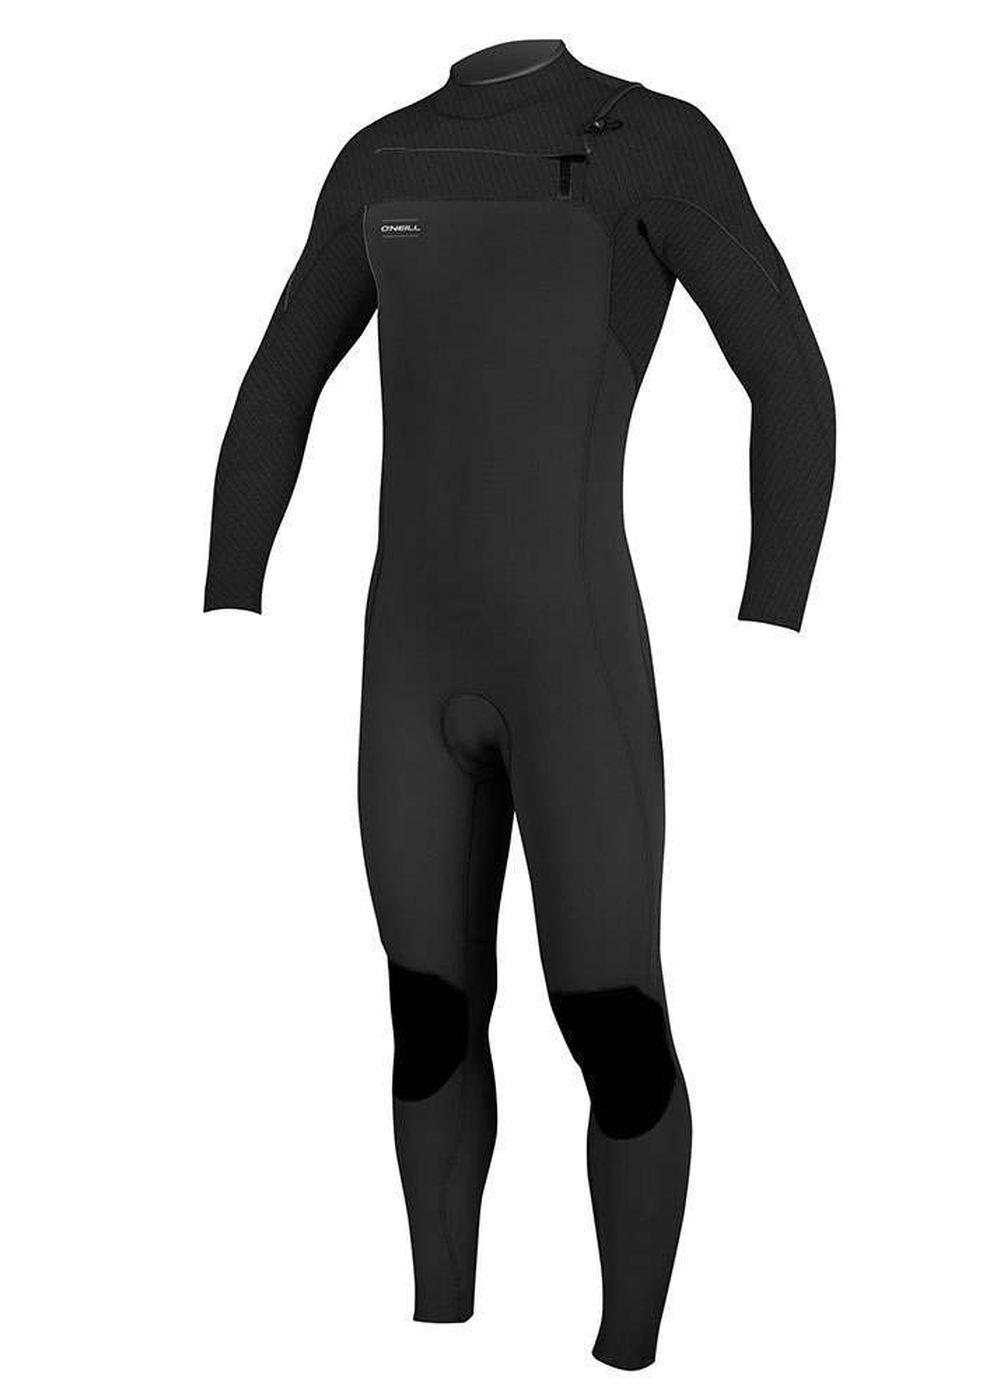 Oneill Hyperfreak Fz 5/4 Wetsuit 2018 Black Picture